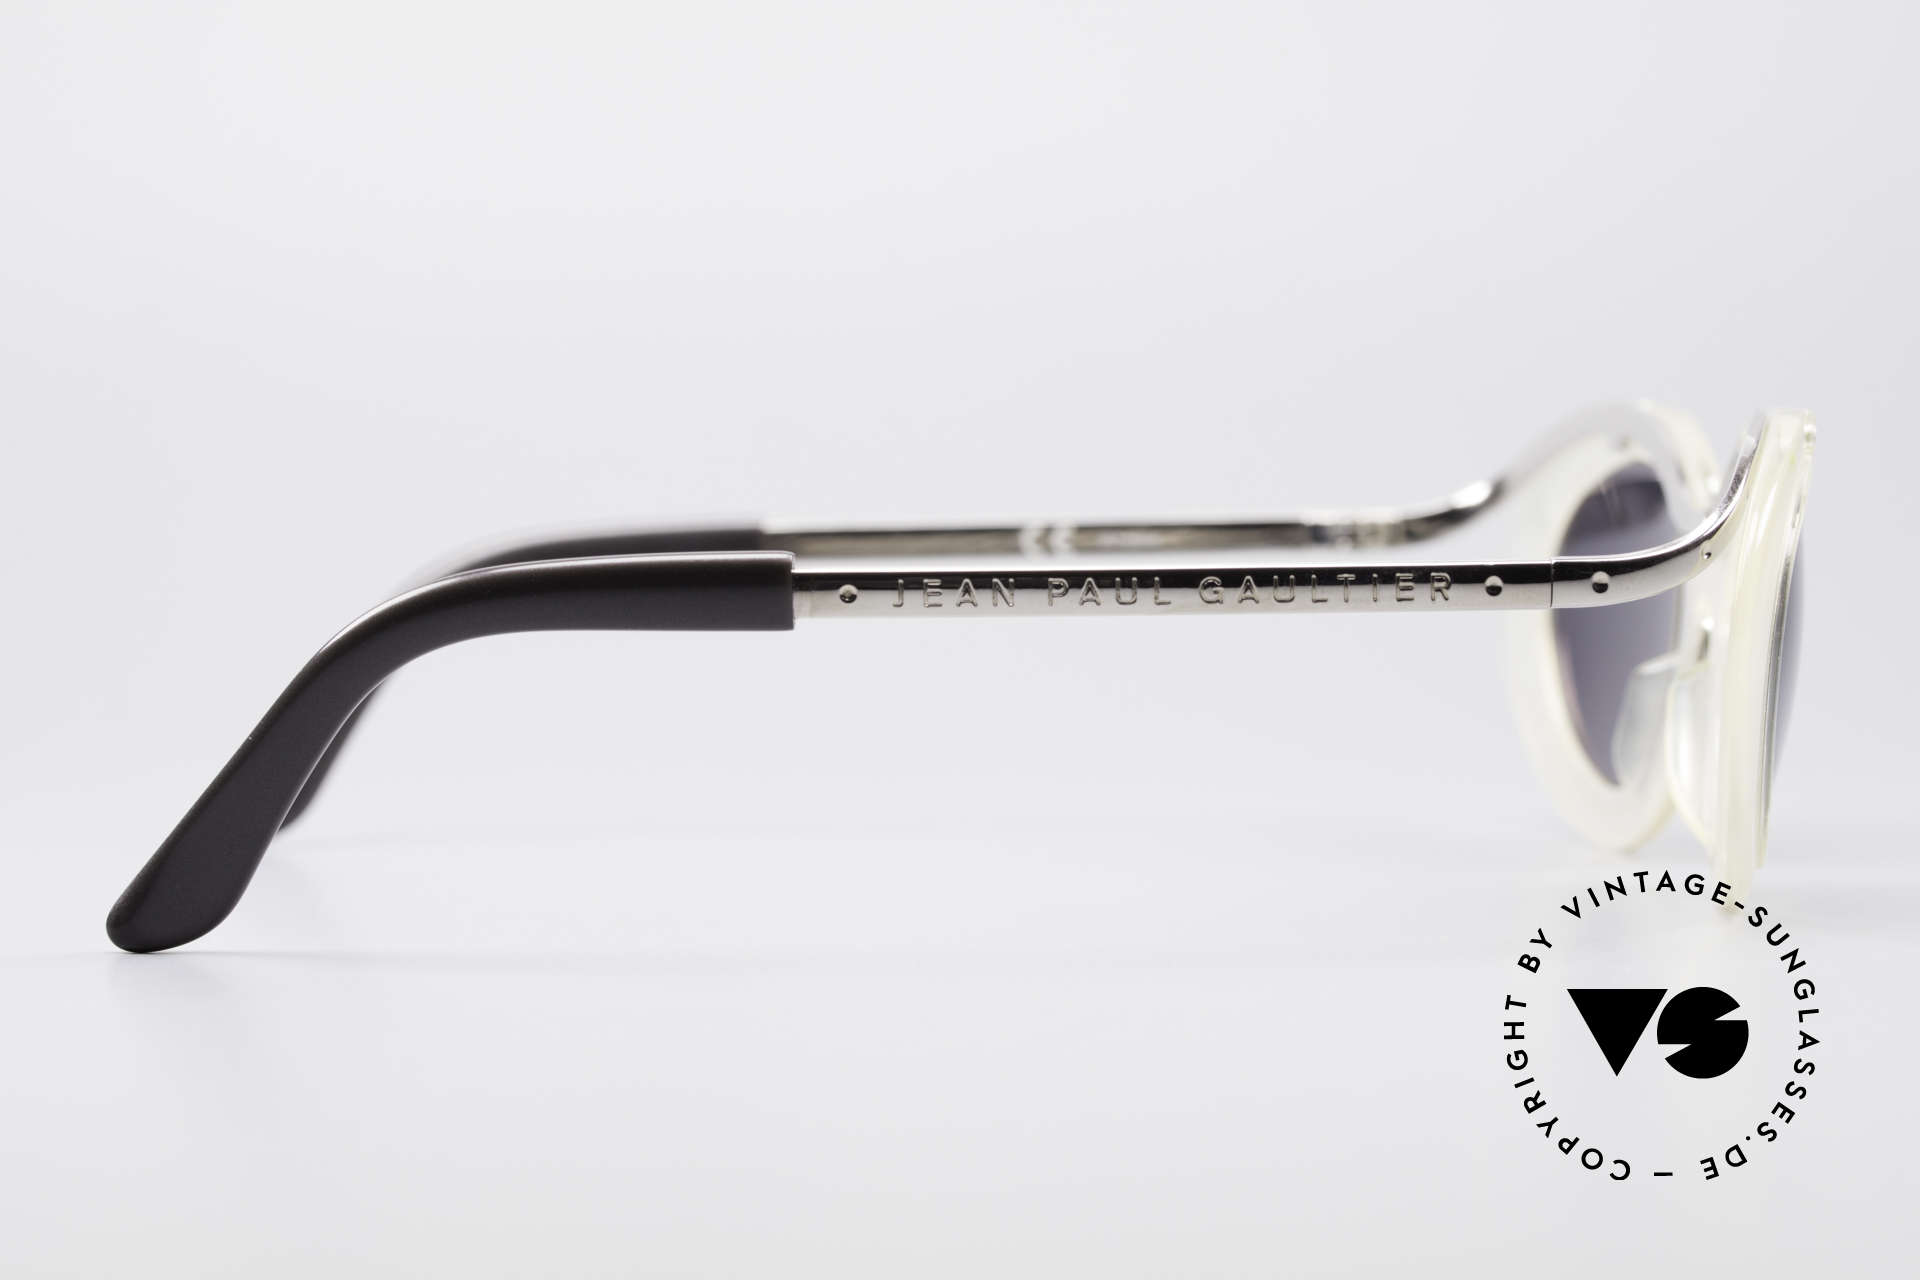 Jean Paul Gaultier 56-7201 Designer Ladies Sunglasses, Size: medium, Made for Women